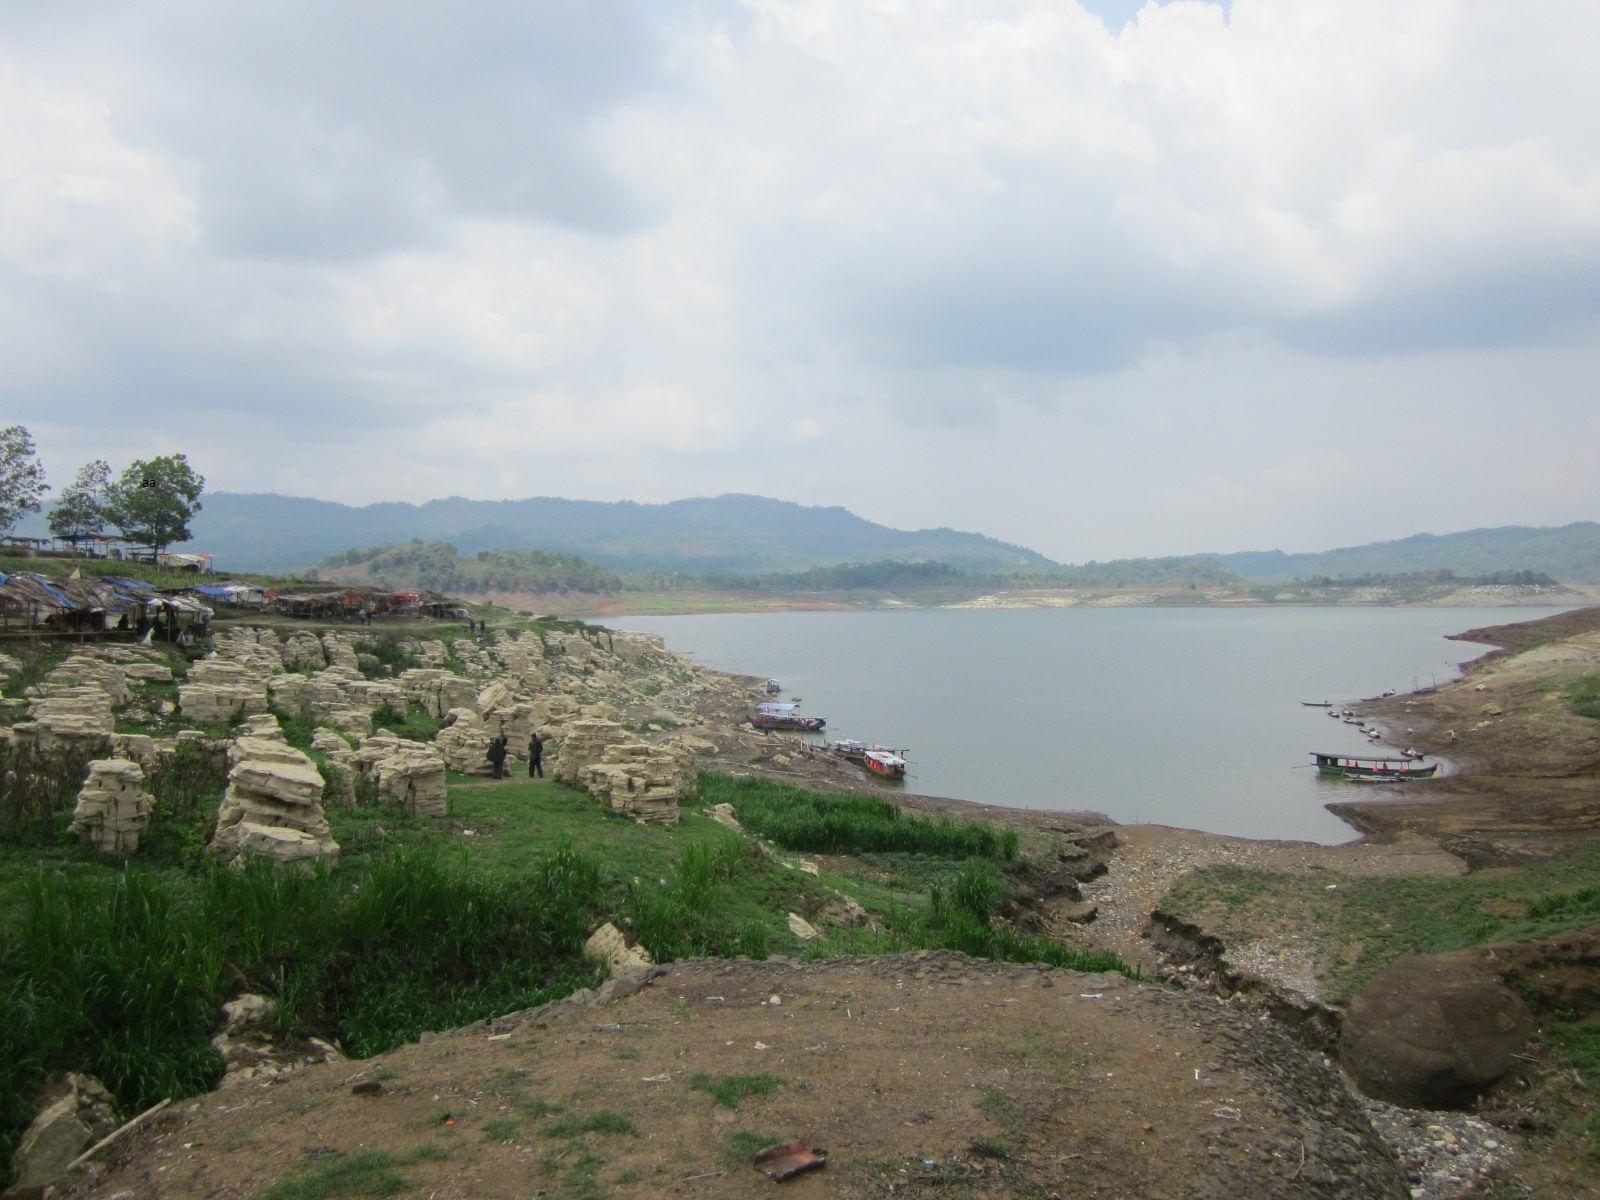 20 Tempat Wisata Wonosobo Menarik Dikunjungi Aneka Seru Lobang Sewu